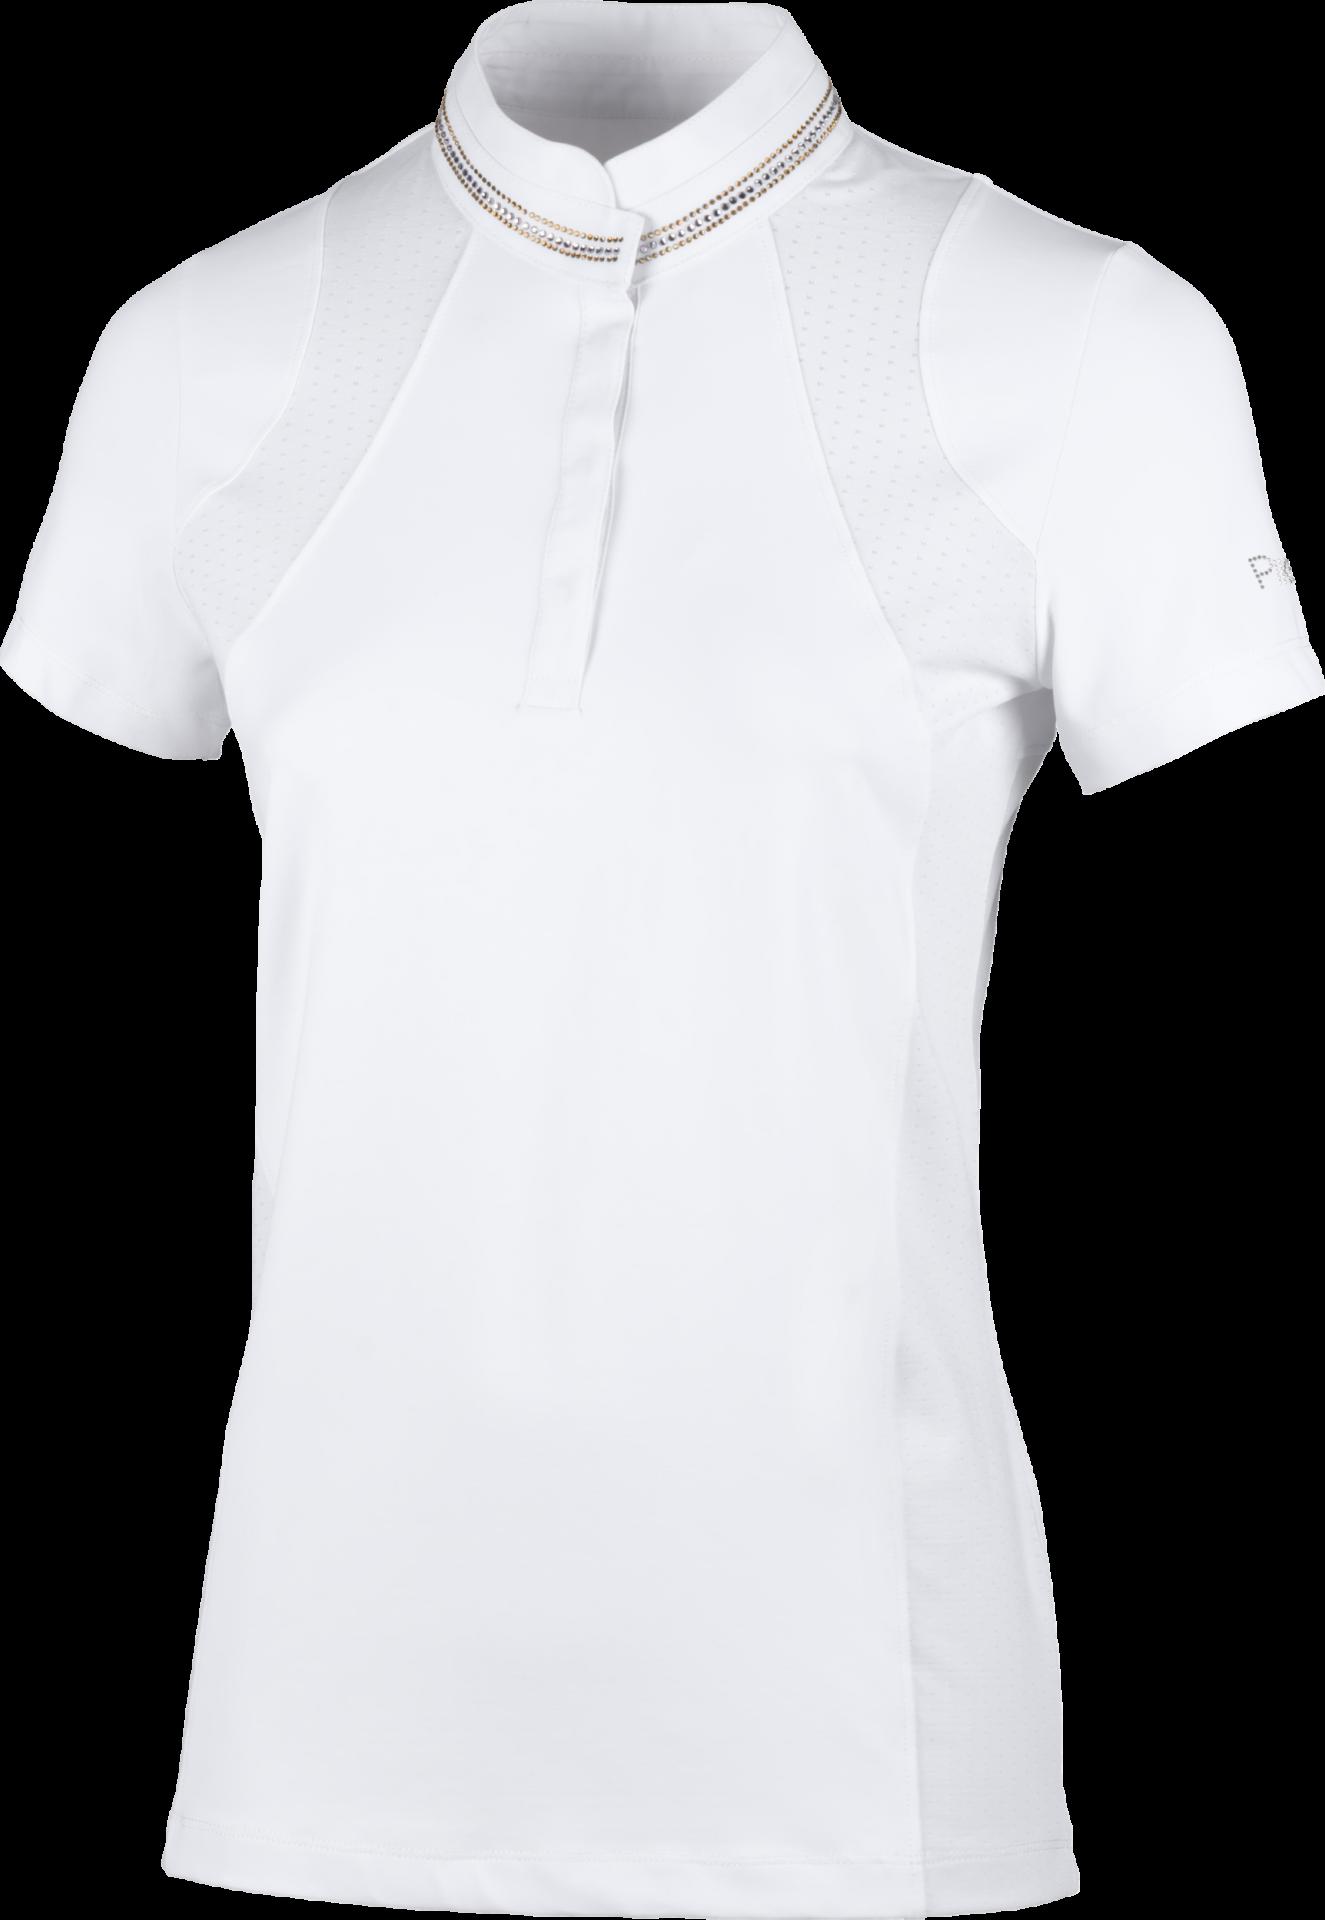 Pikeur Phiola Show Competition Shirt